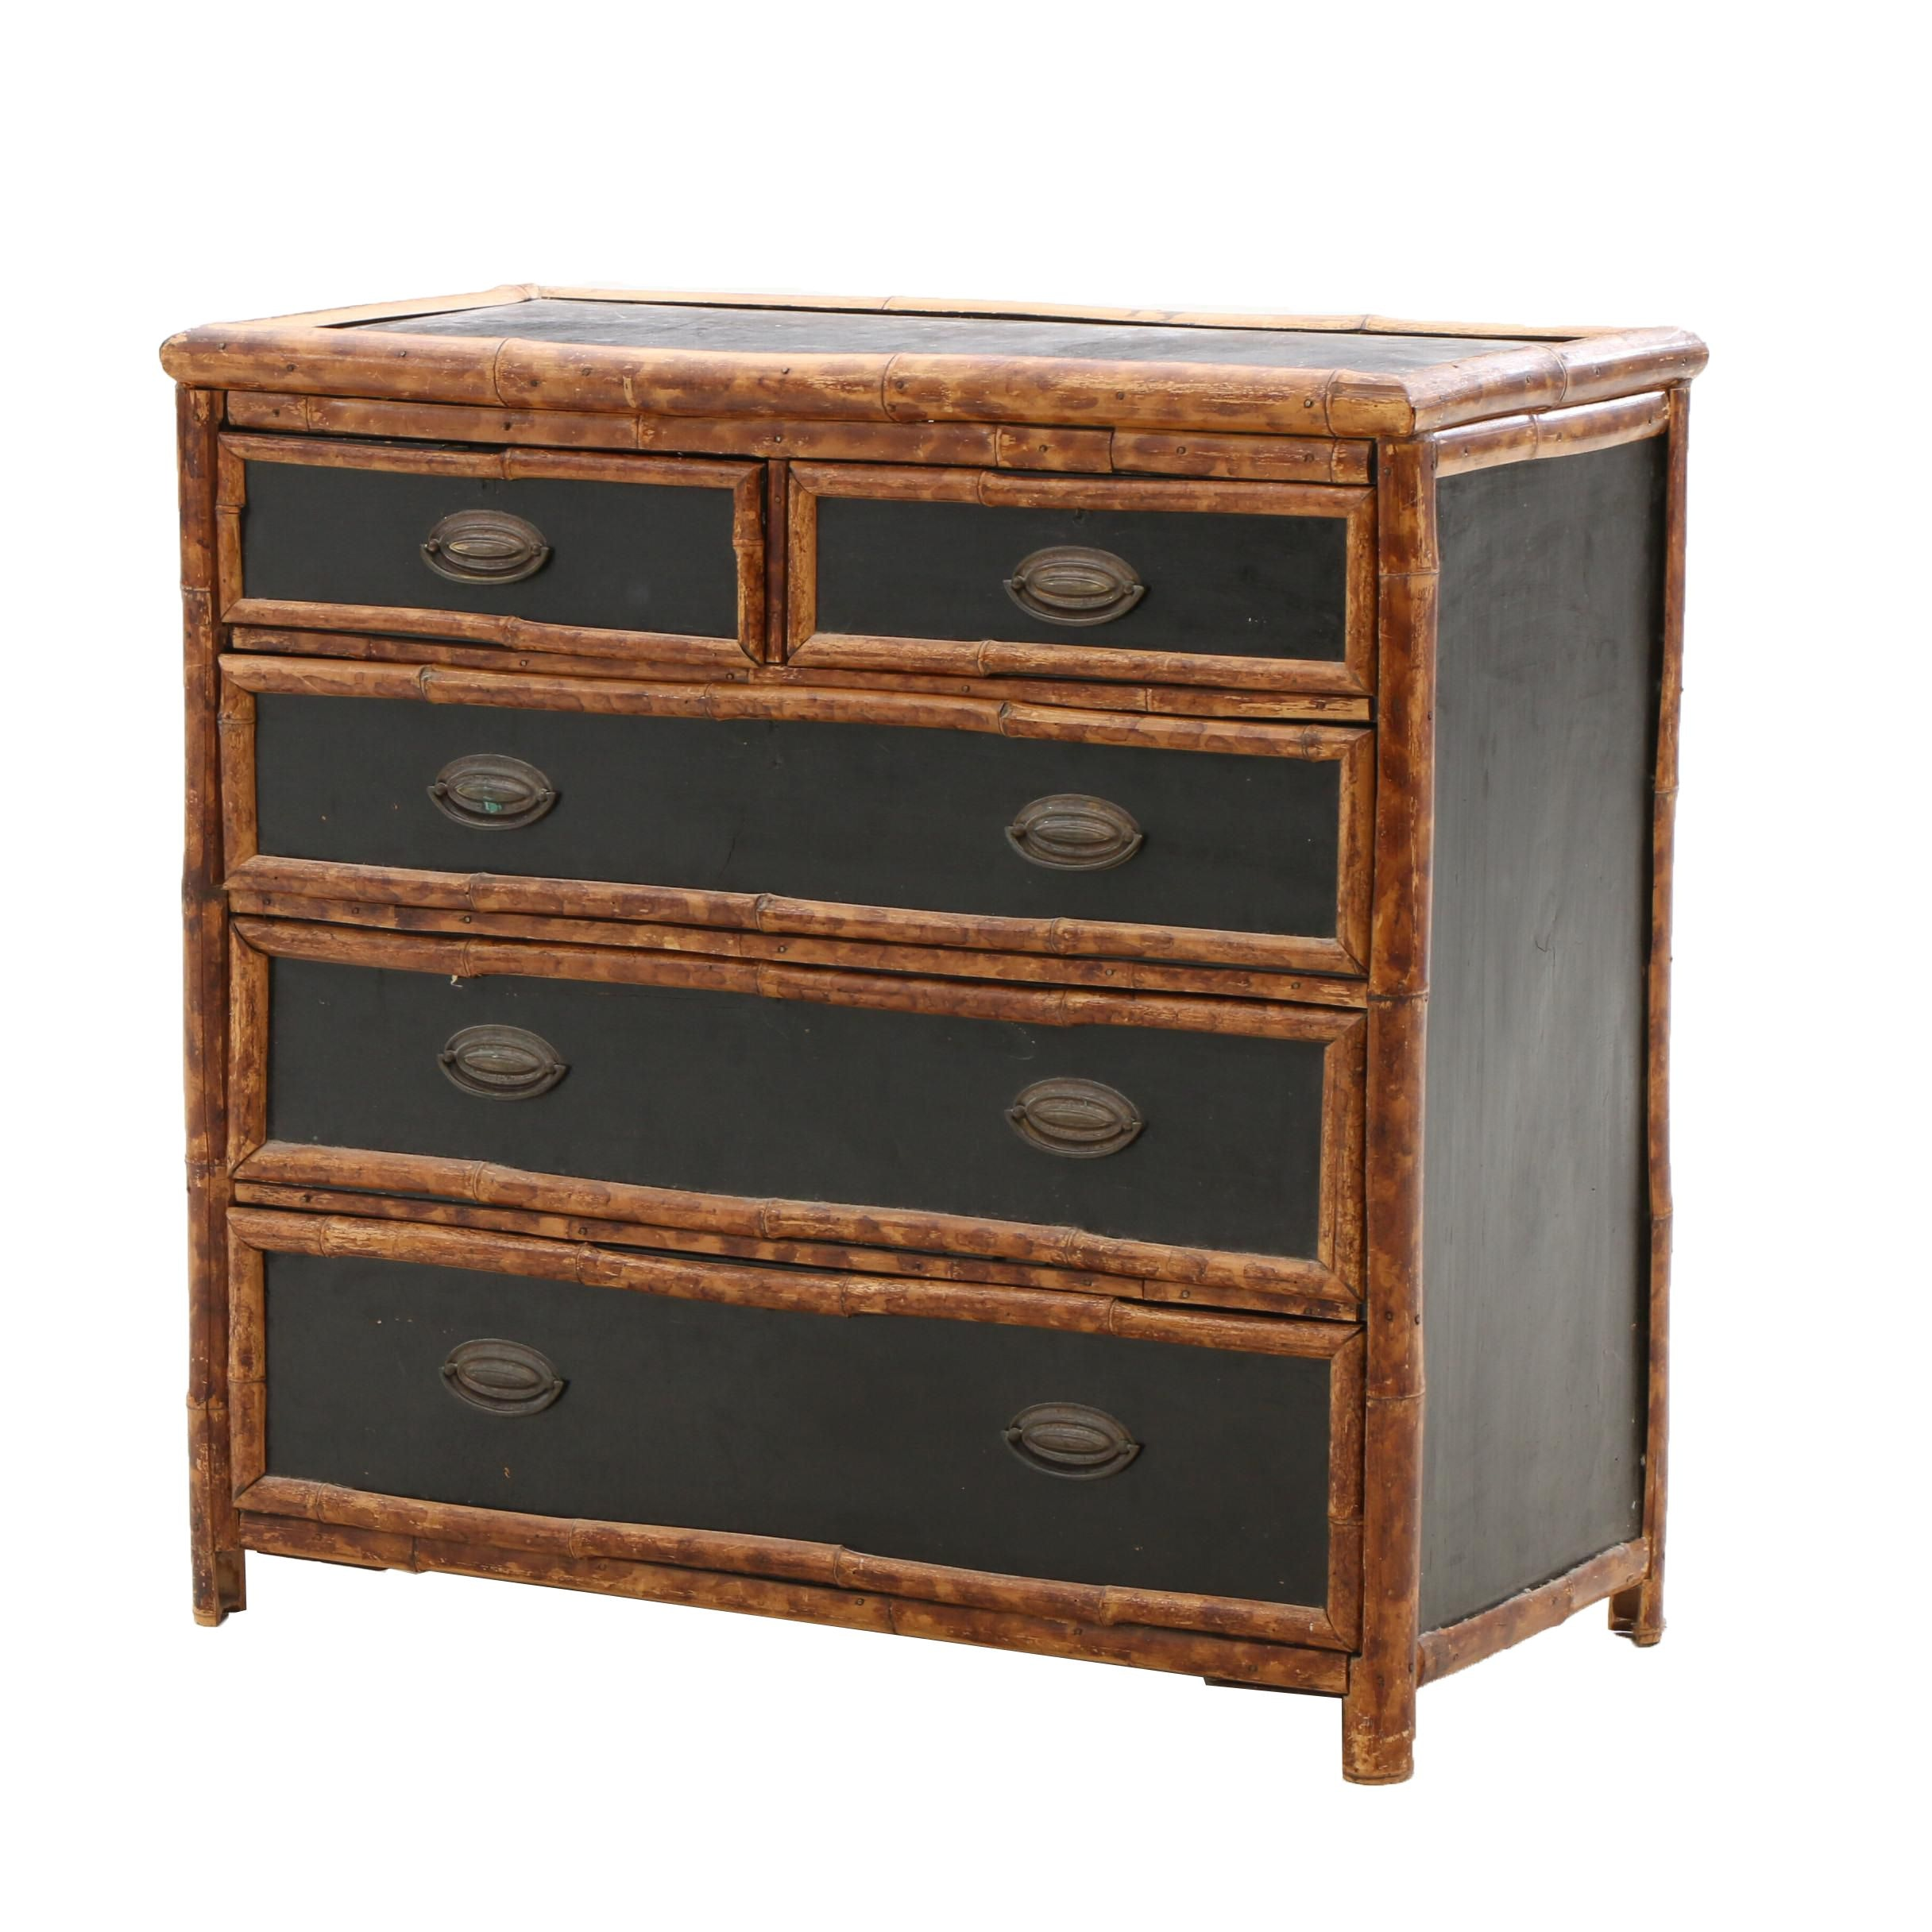 Late 19th Century Rattan Framed Dresser